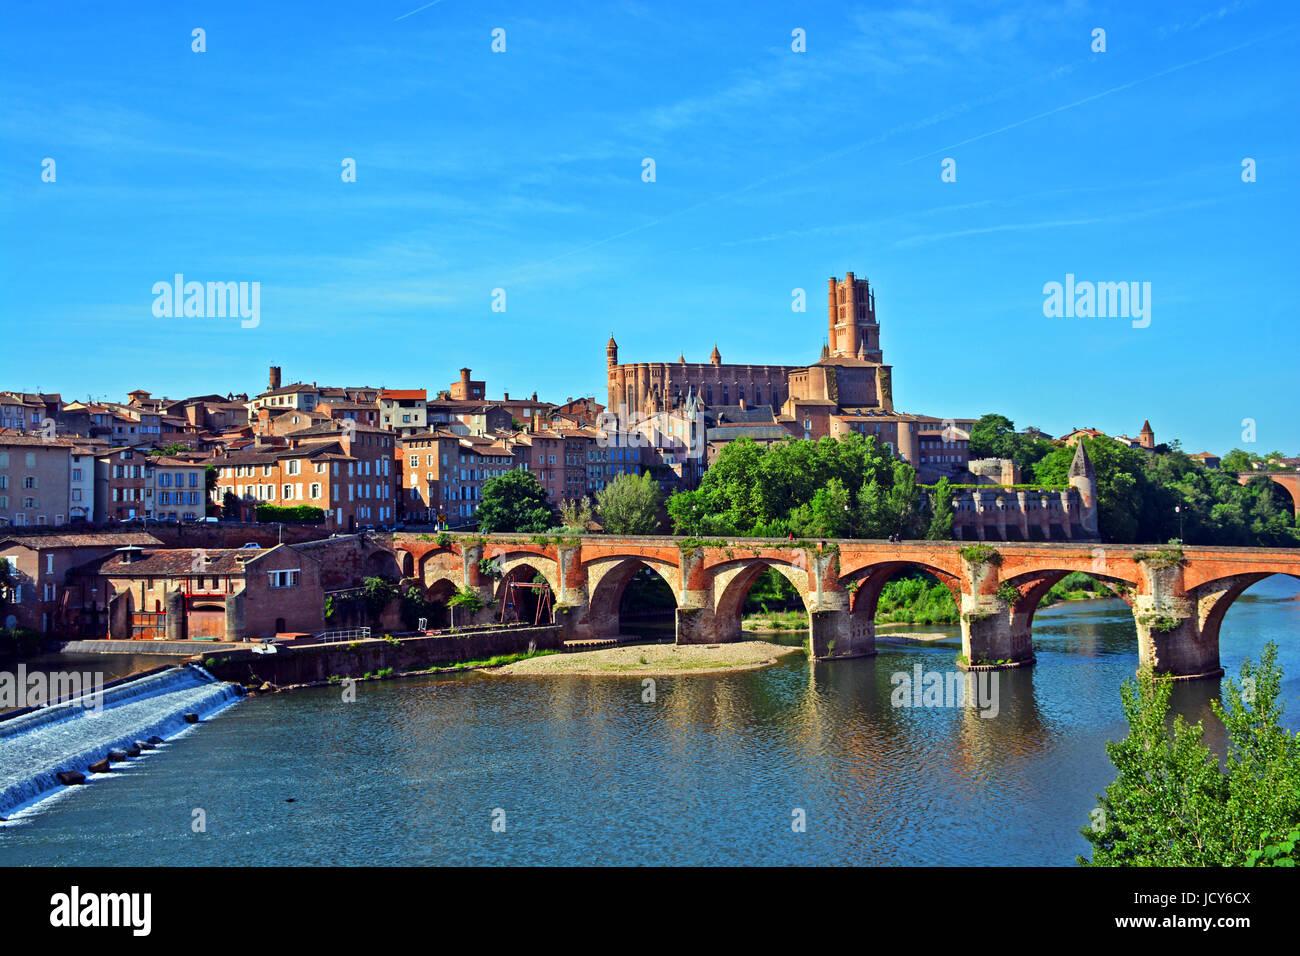 Albi, Tarn, France - Stock Image